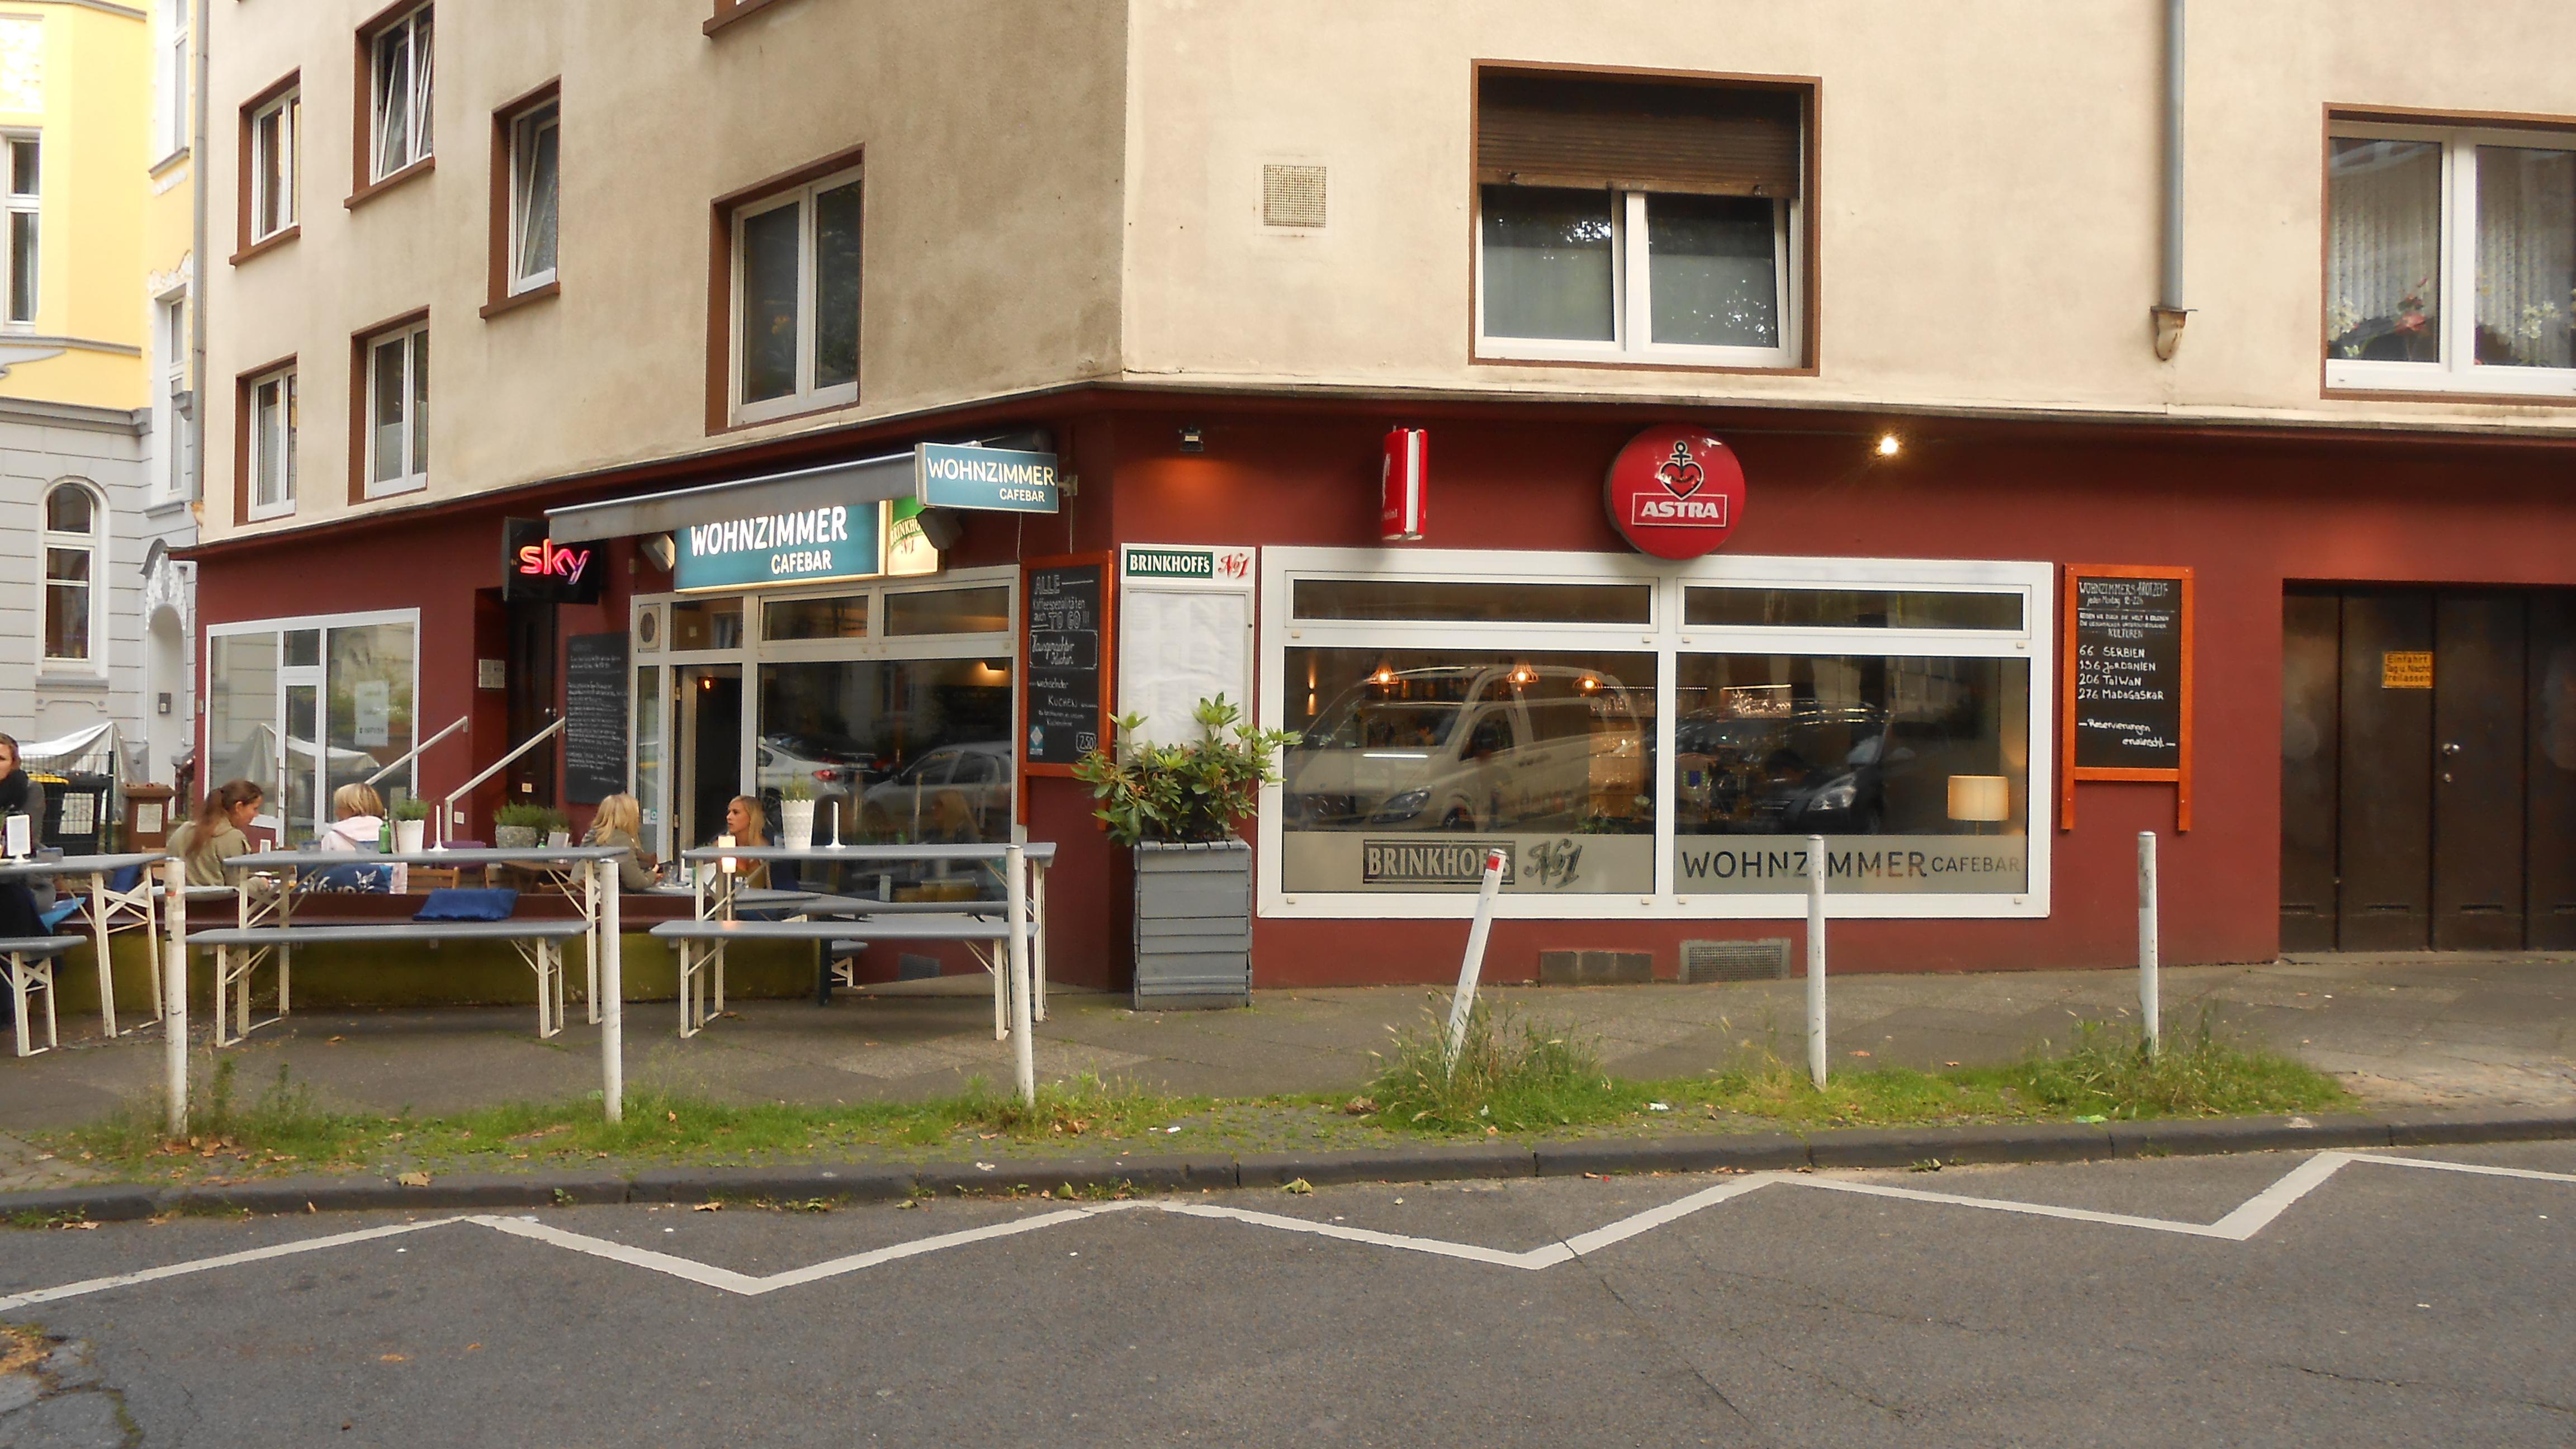 File:Wohnzimmer CaféBar, Dortmund (2).   Wikimedia Commons